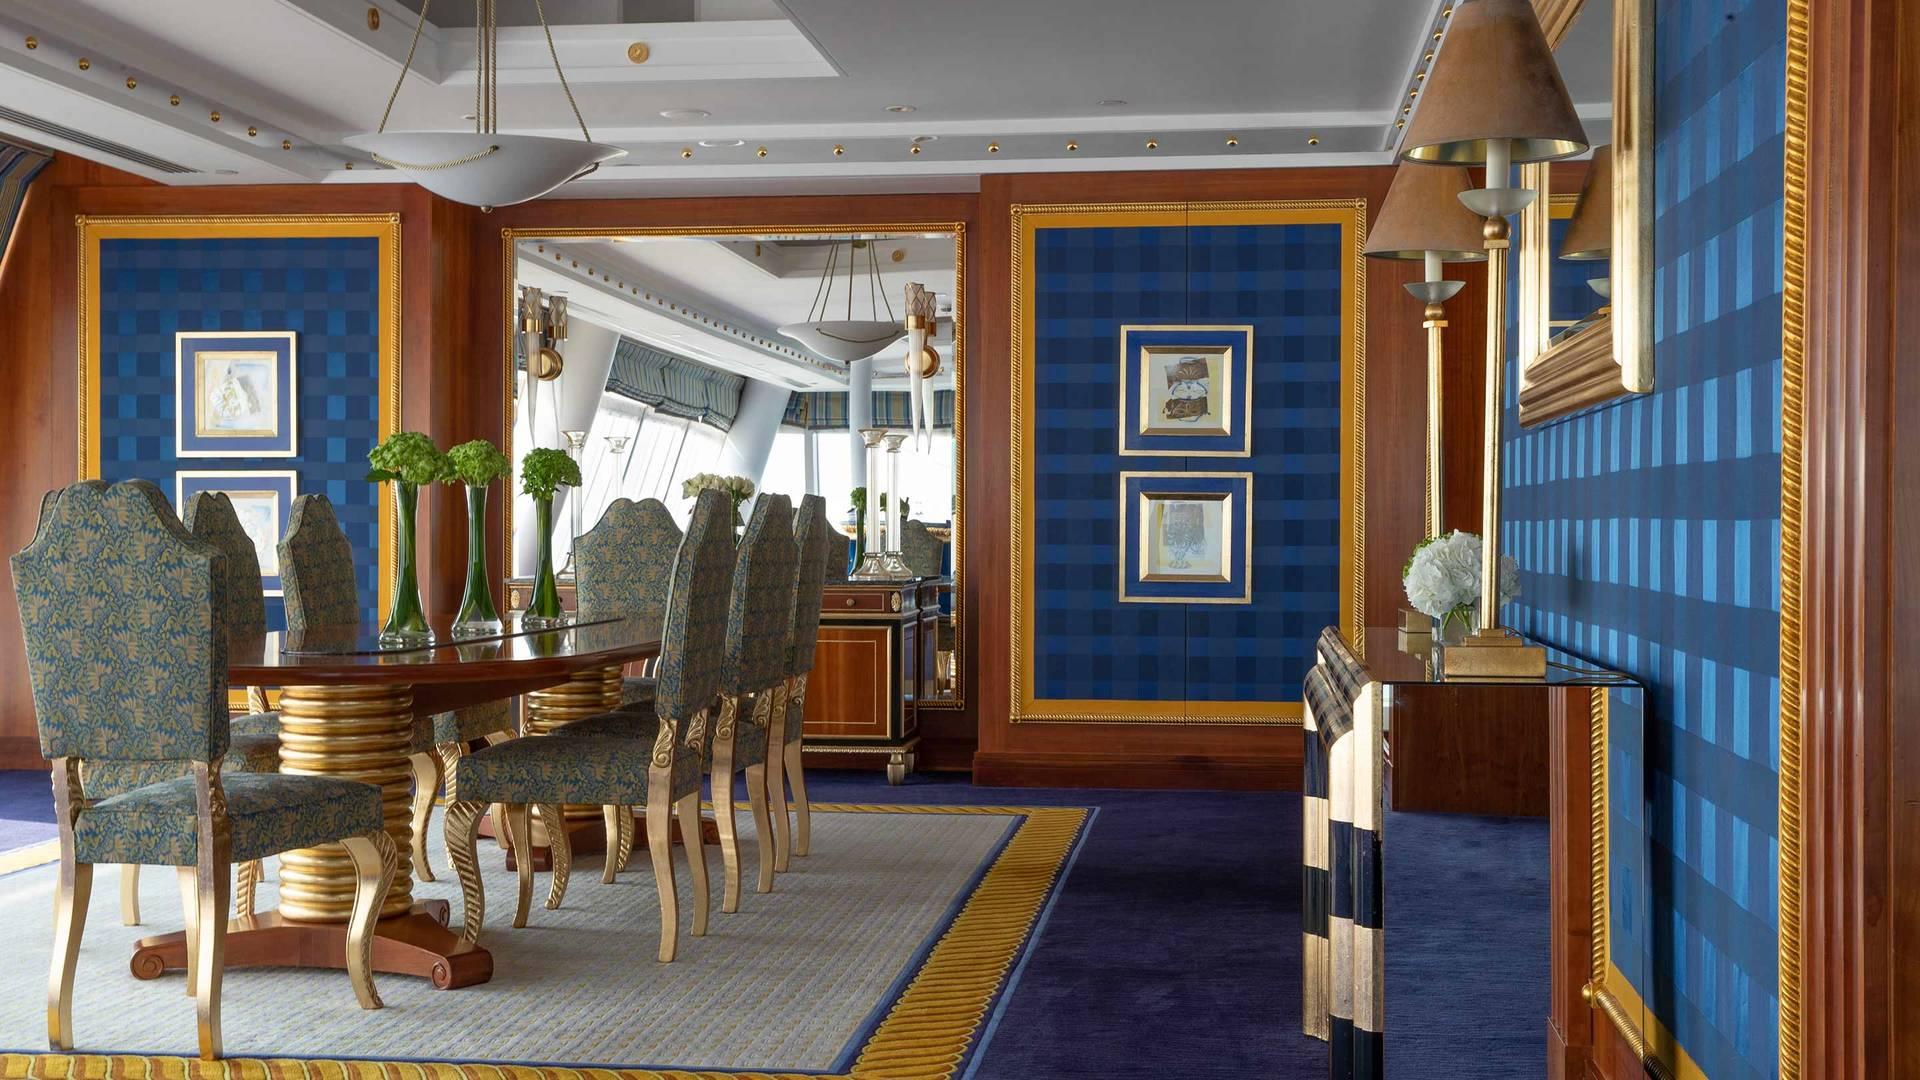 Jumeirah Burj Al Arab Diplomatic three bedroom suite Dining room